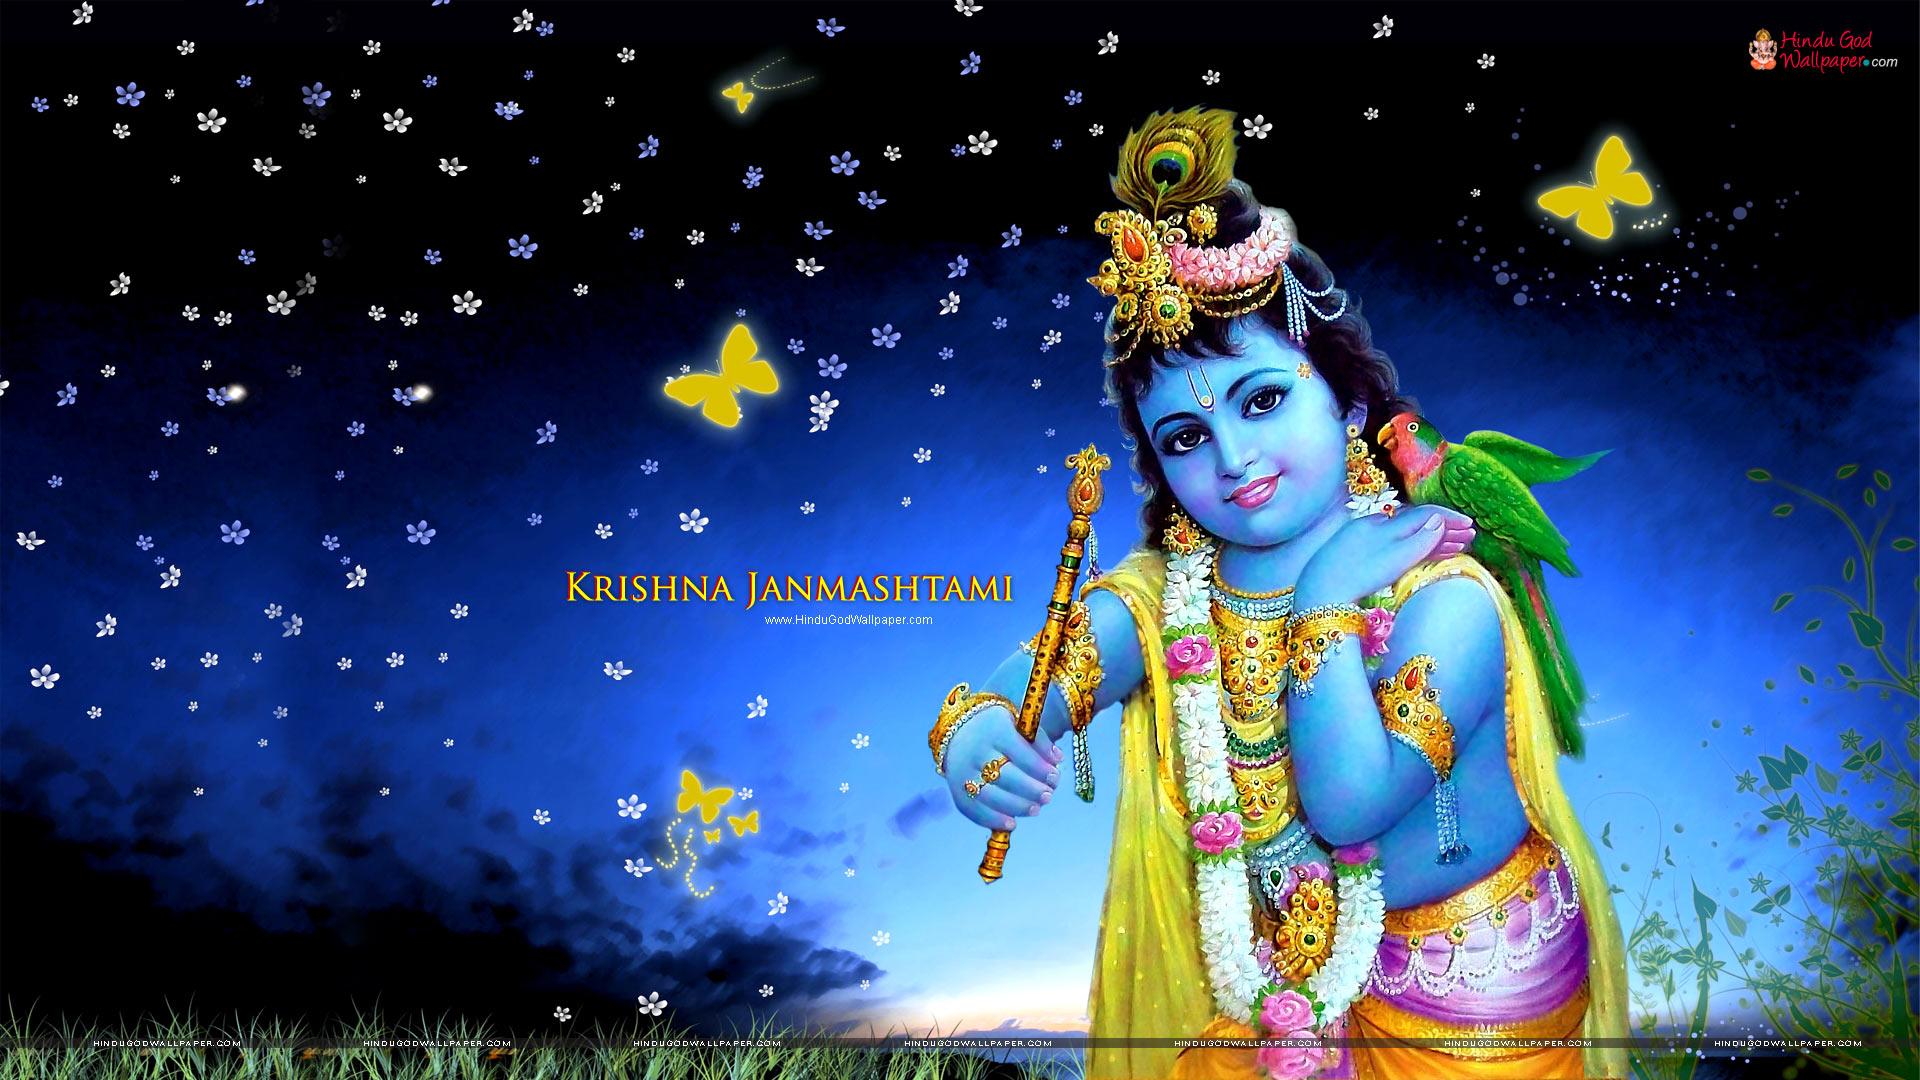 Happy Krishna Janmashtami 2015 Images Messages Greetingskrishna